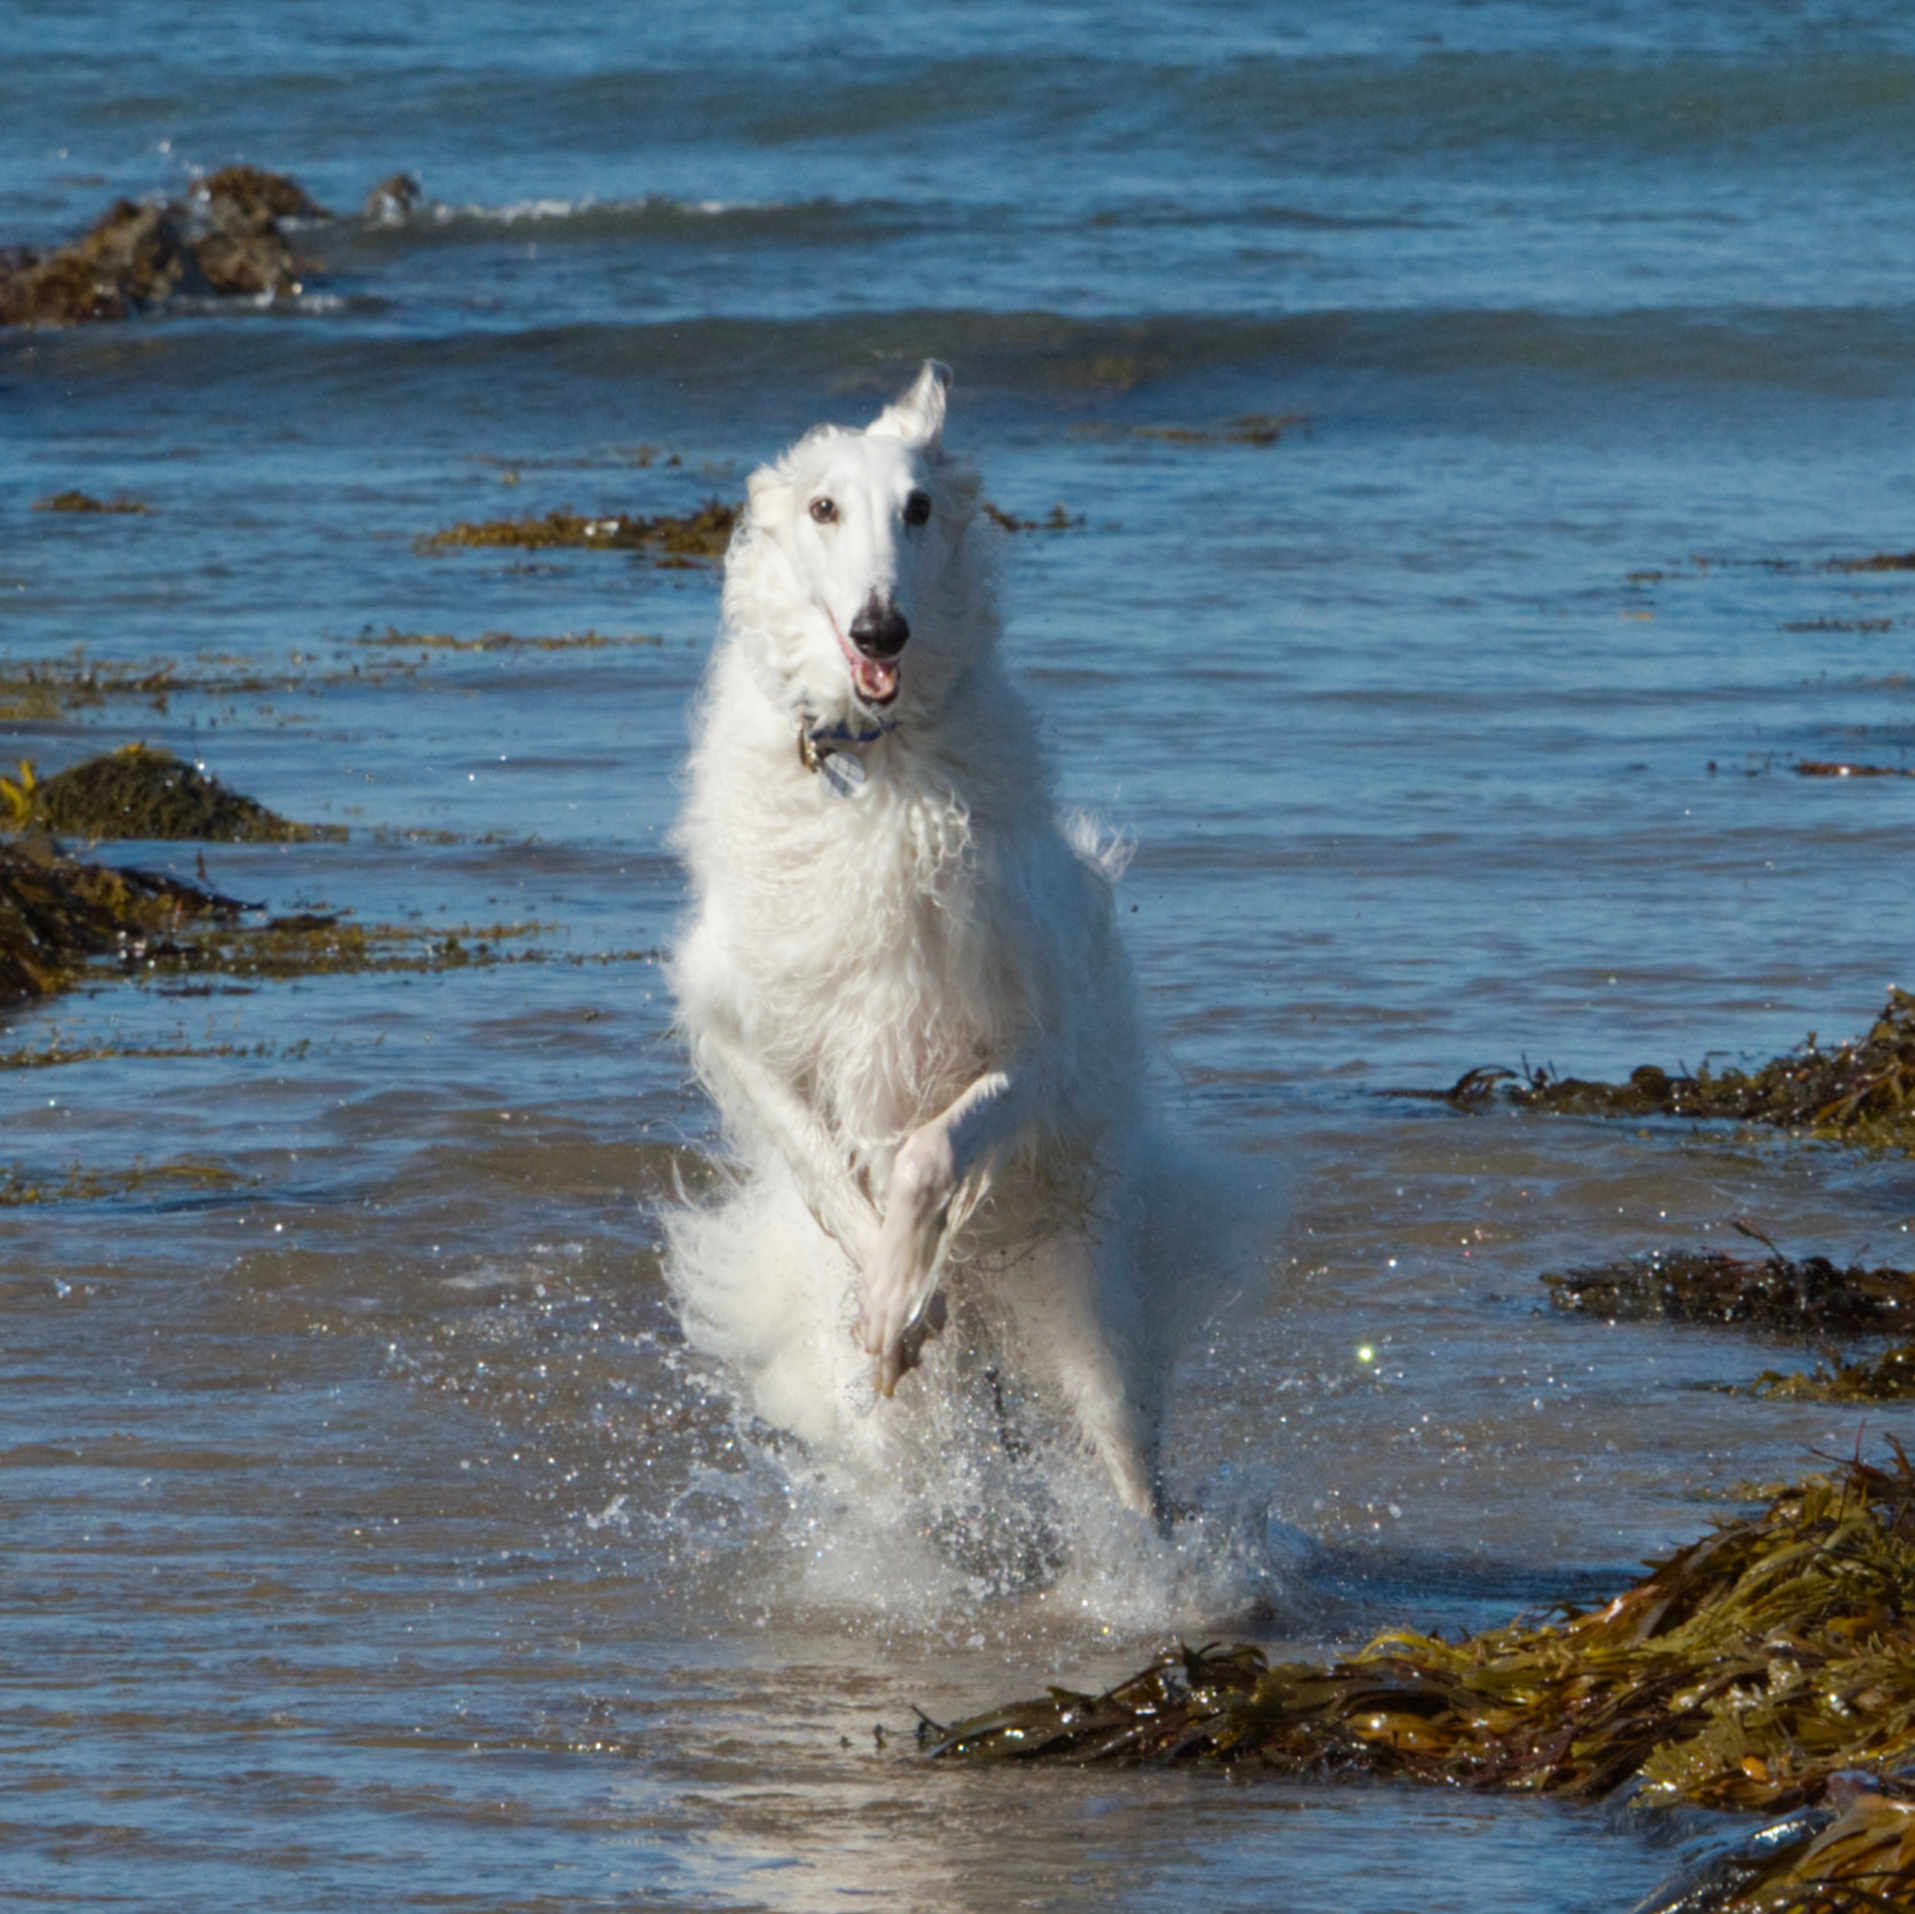 BEE_7431NadinaBee Dog Lifestyle Photo Beach